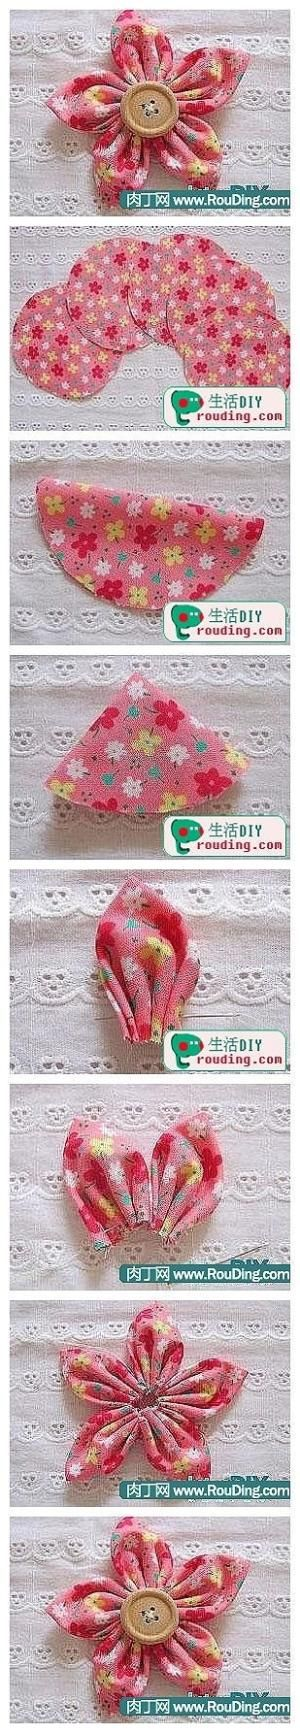 fabric flower tutorial by isrc